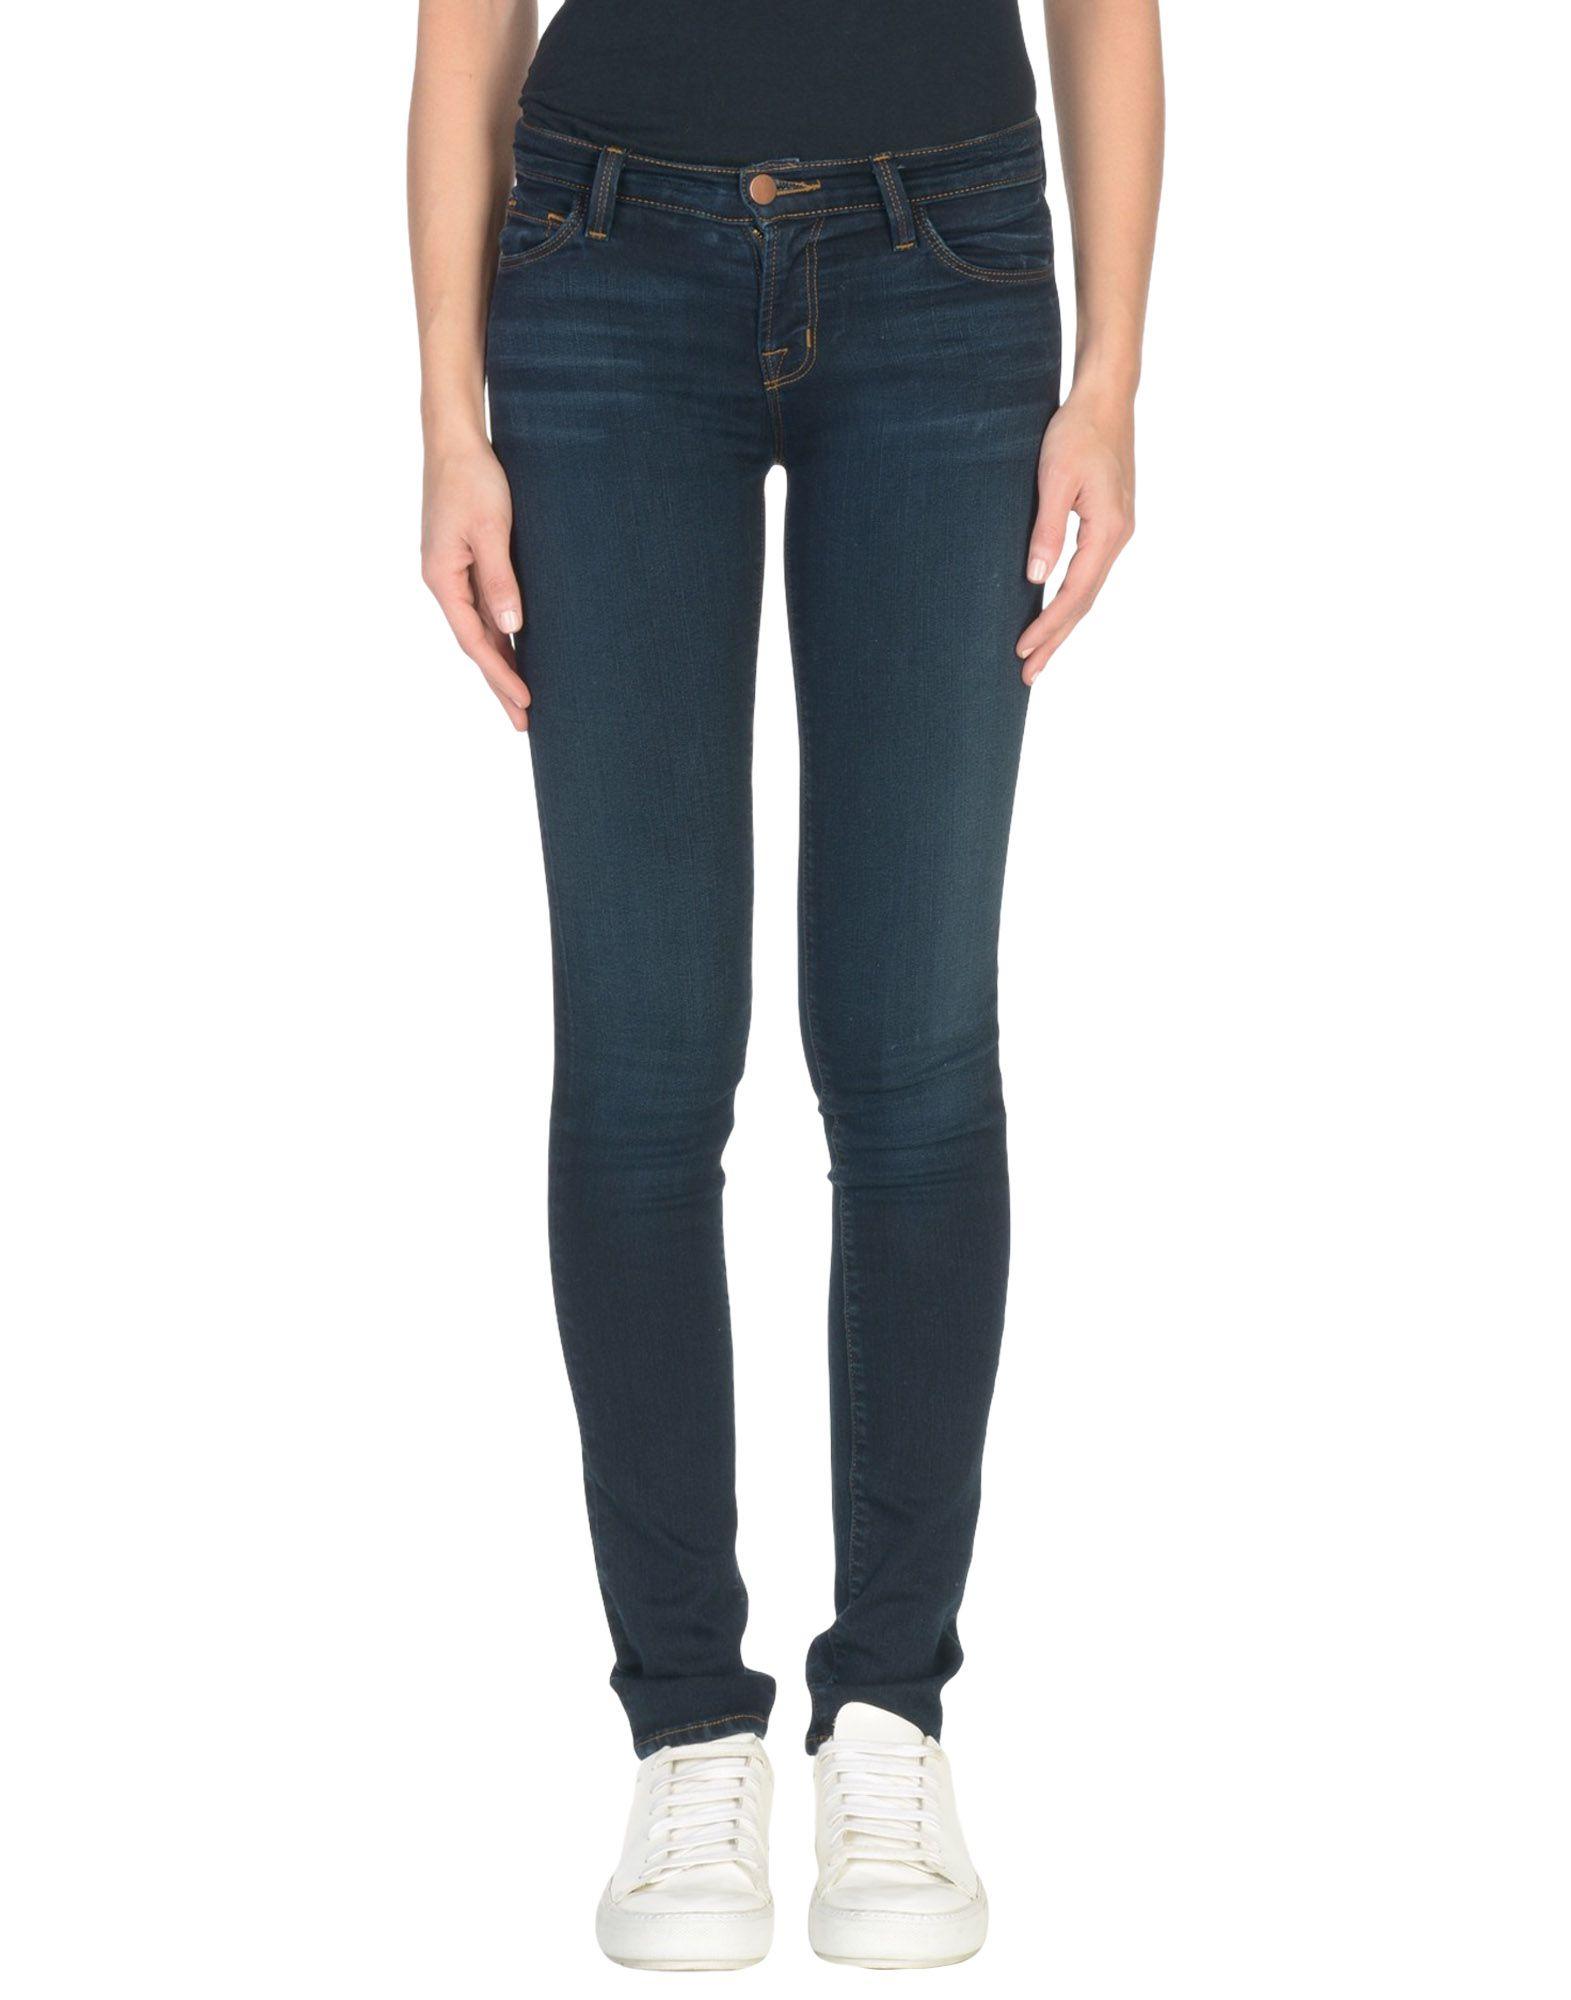 Pantaloni Jeans J Brand Donna - Acquista online su gNRGpbGJY